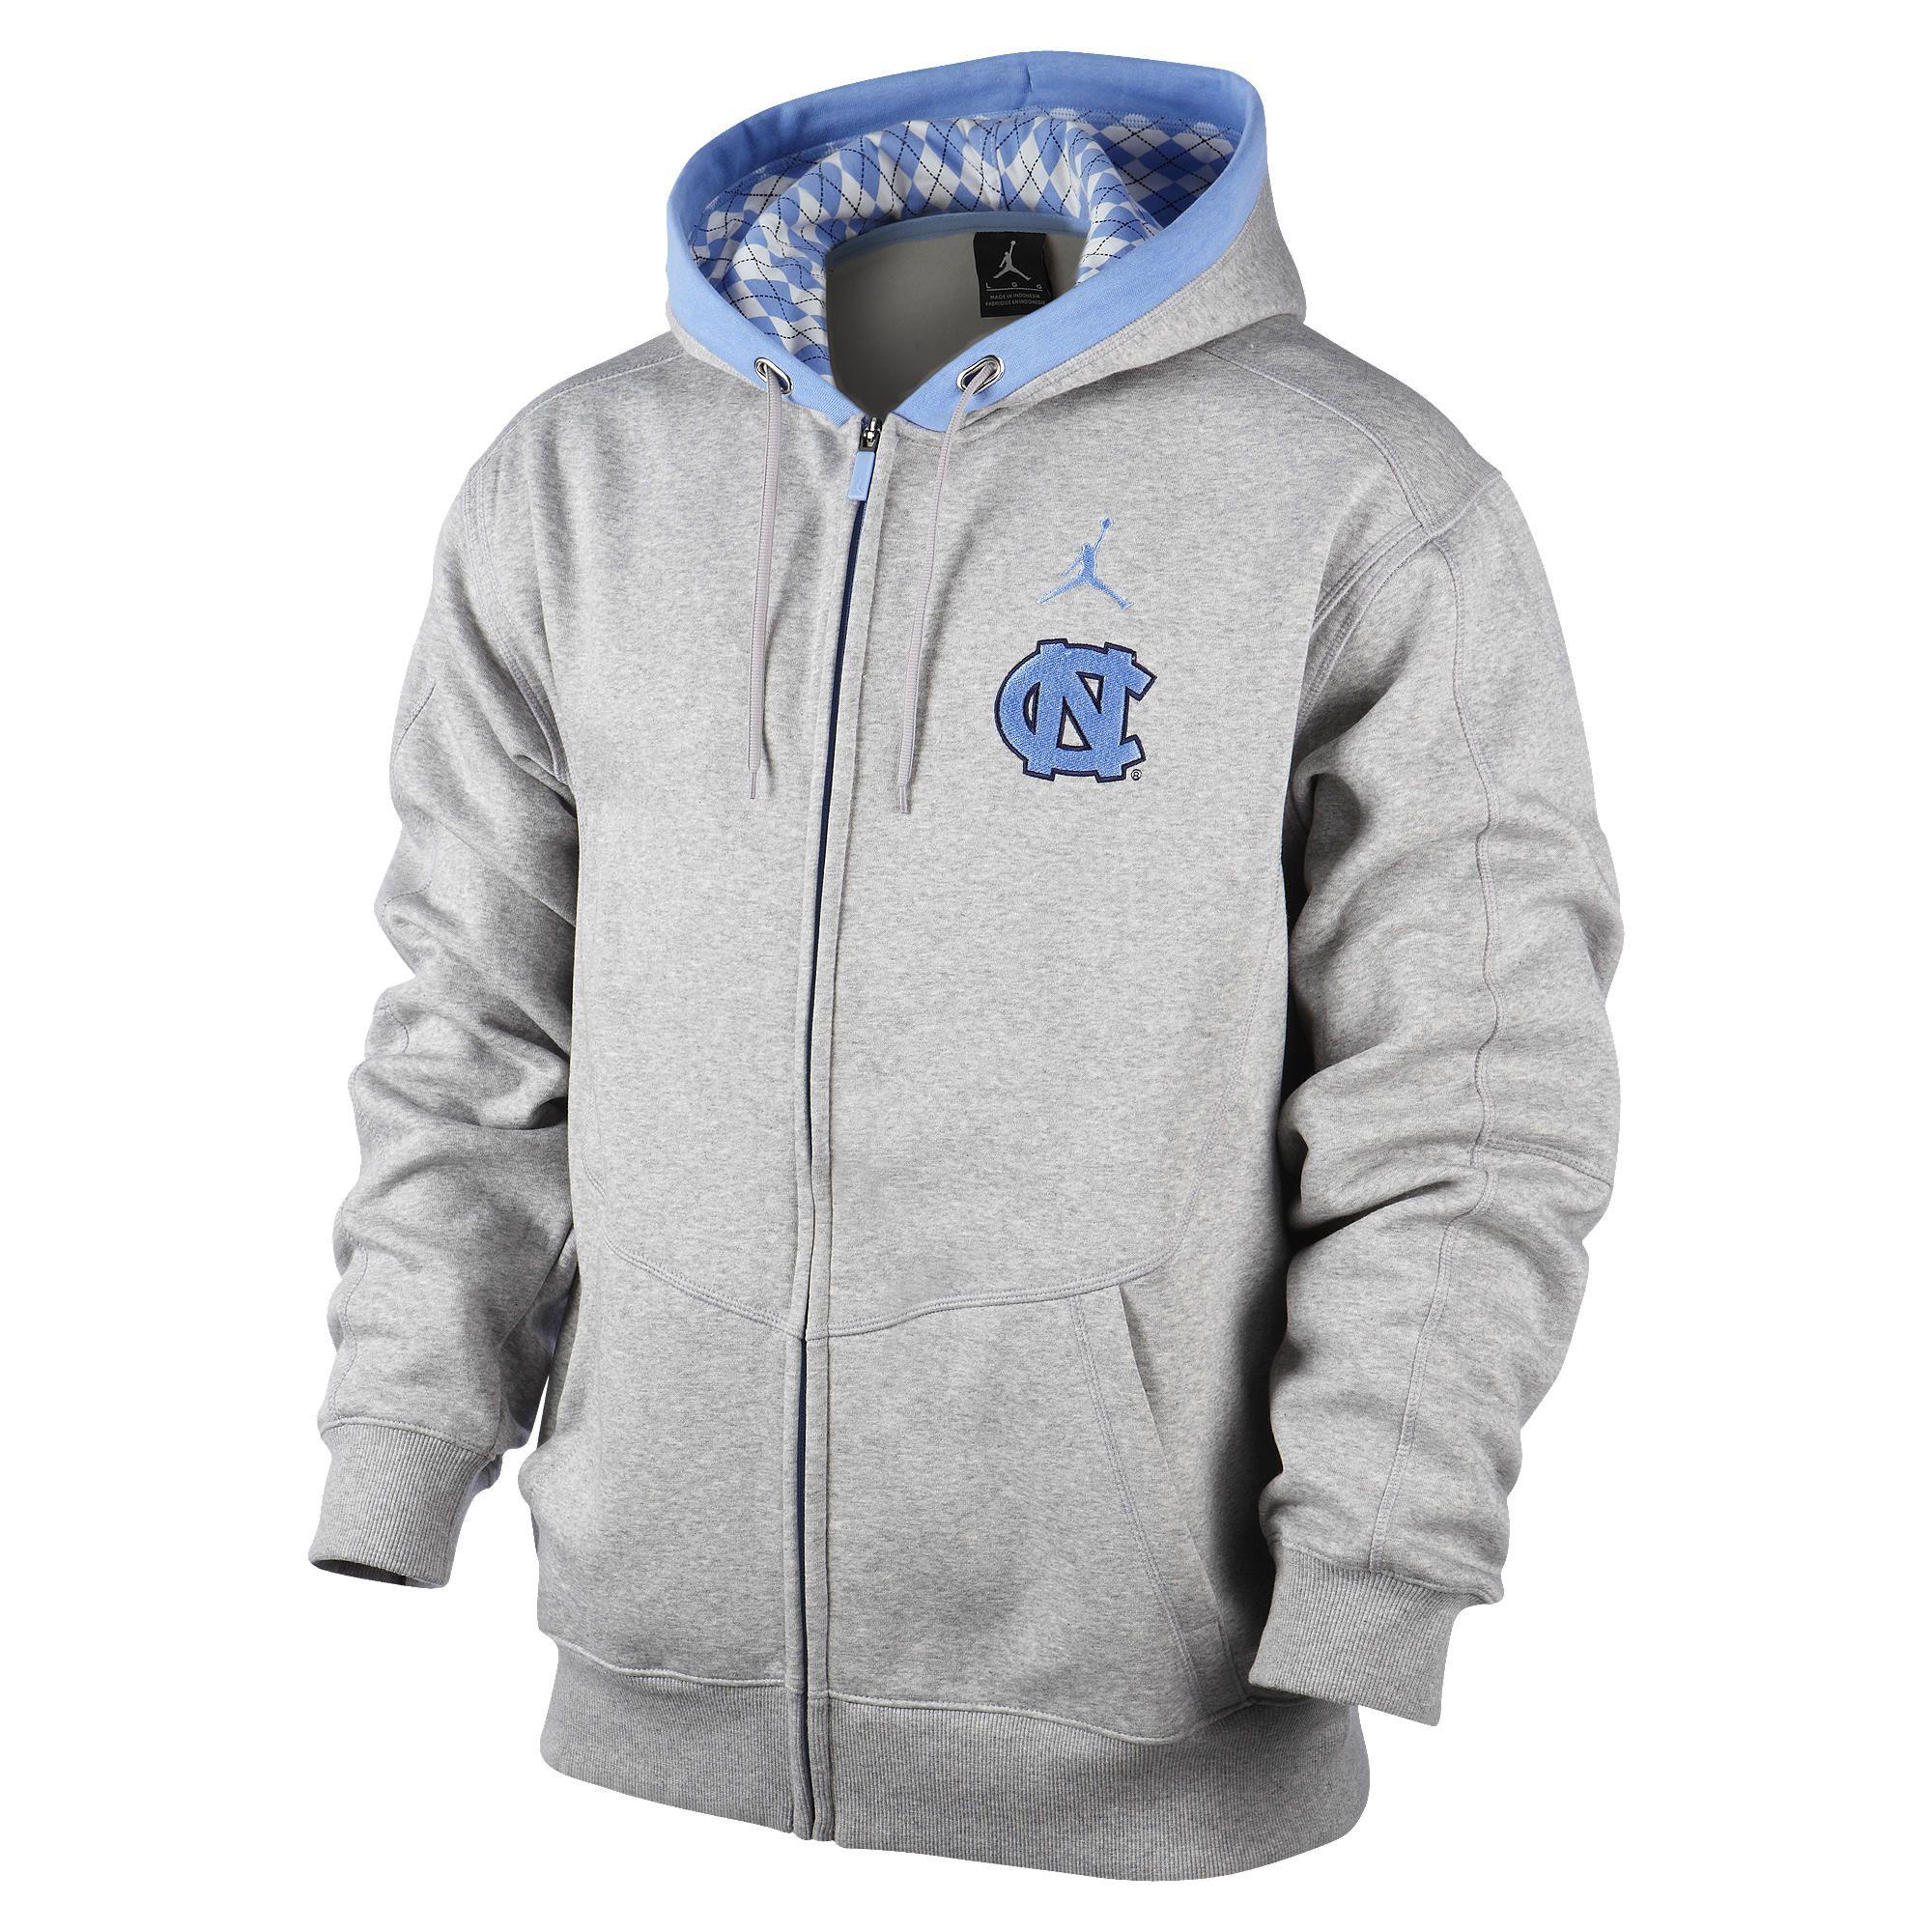 7a6298e881 where to buy jordan unc elite hoodie c2101 77a84